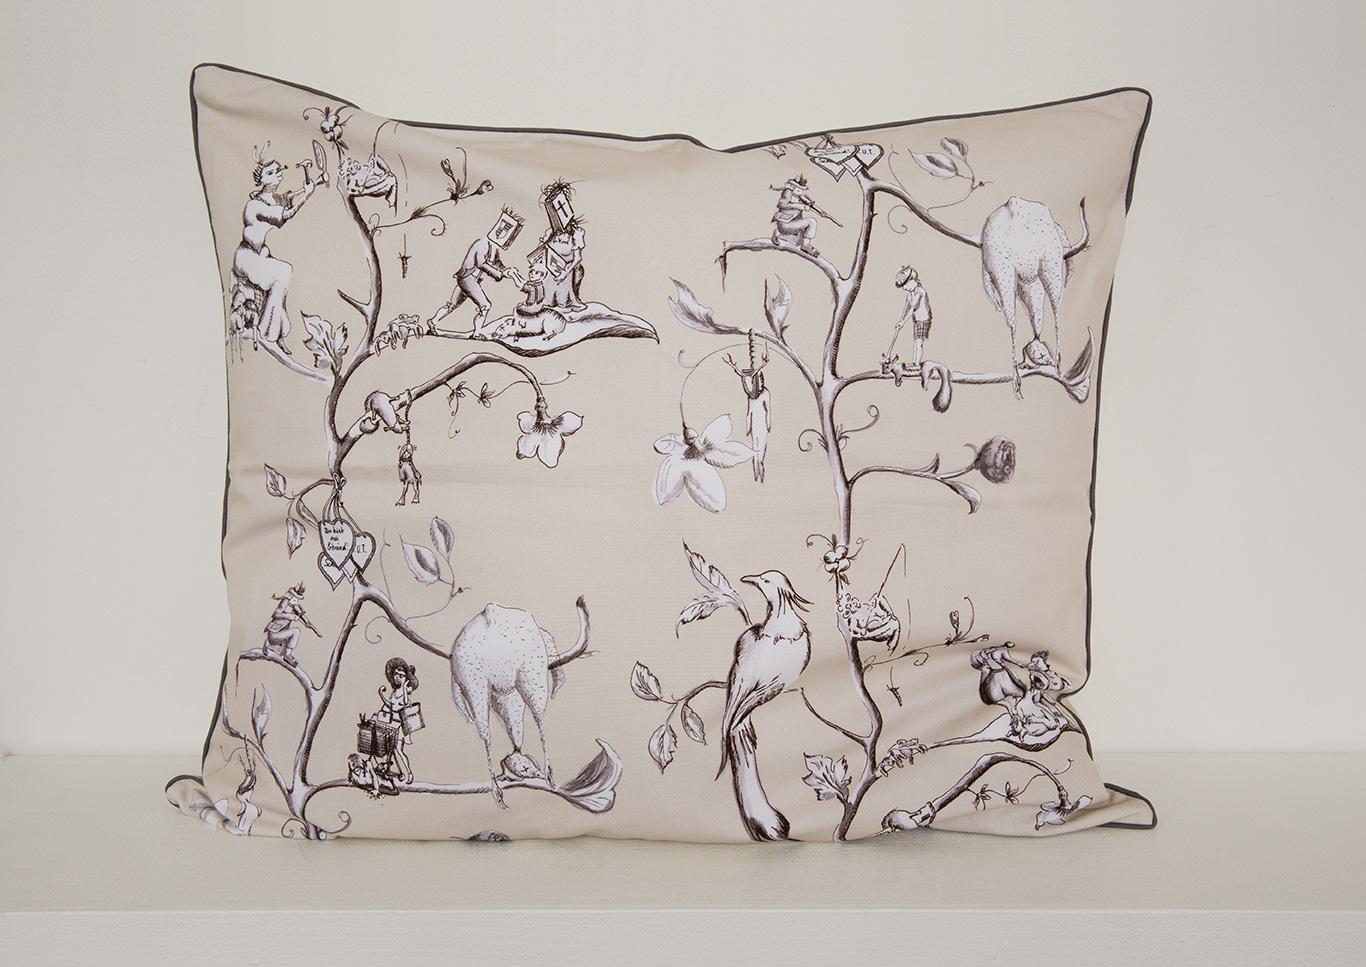 Pillow No. 1 | 60 x 70 cm, 2014 | Edition 1/1